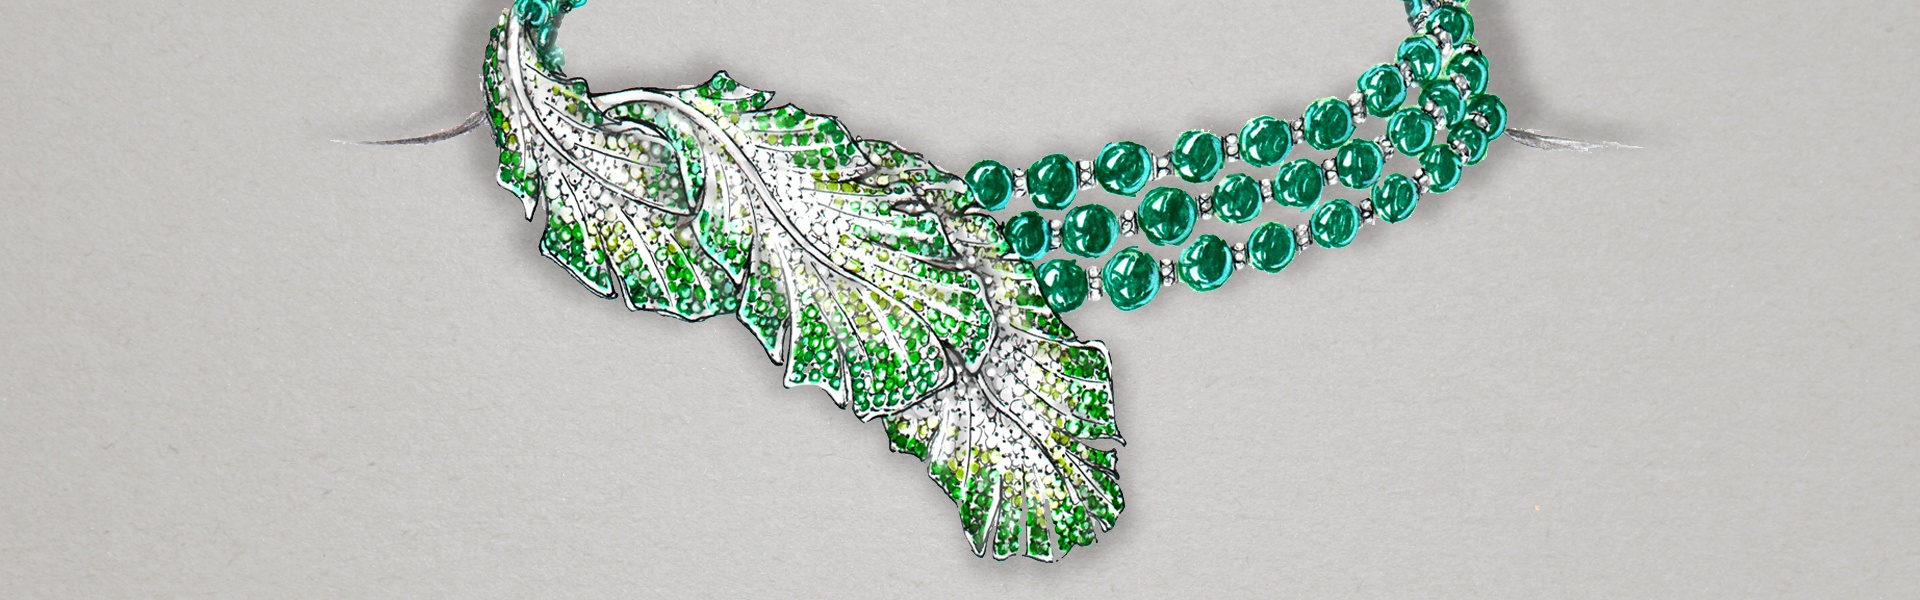 Fei Liu's bespoke Green Tourmaline Feather Neckpiece sketch.